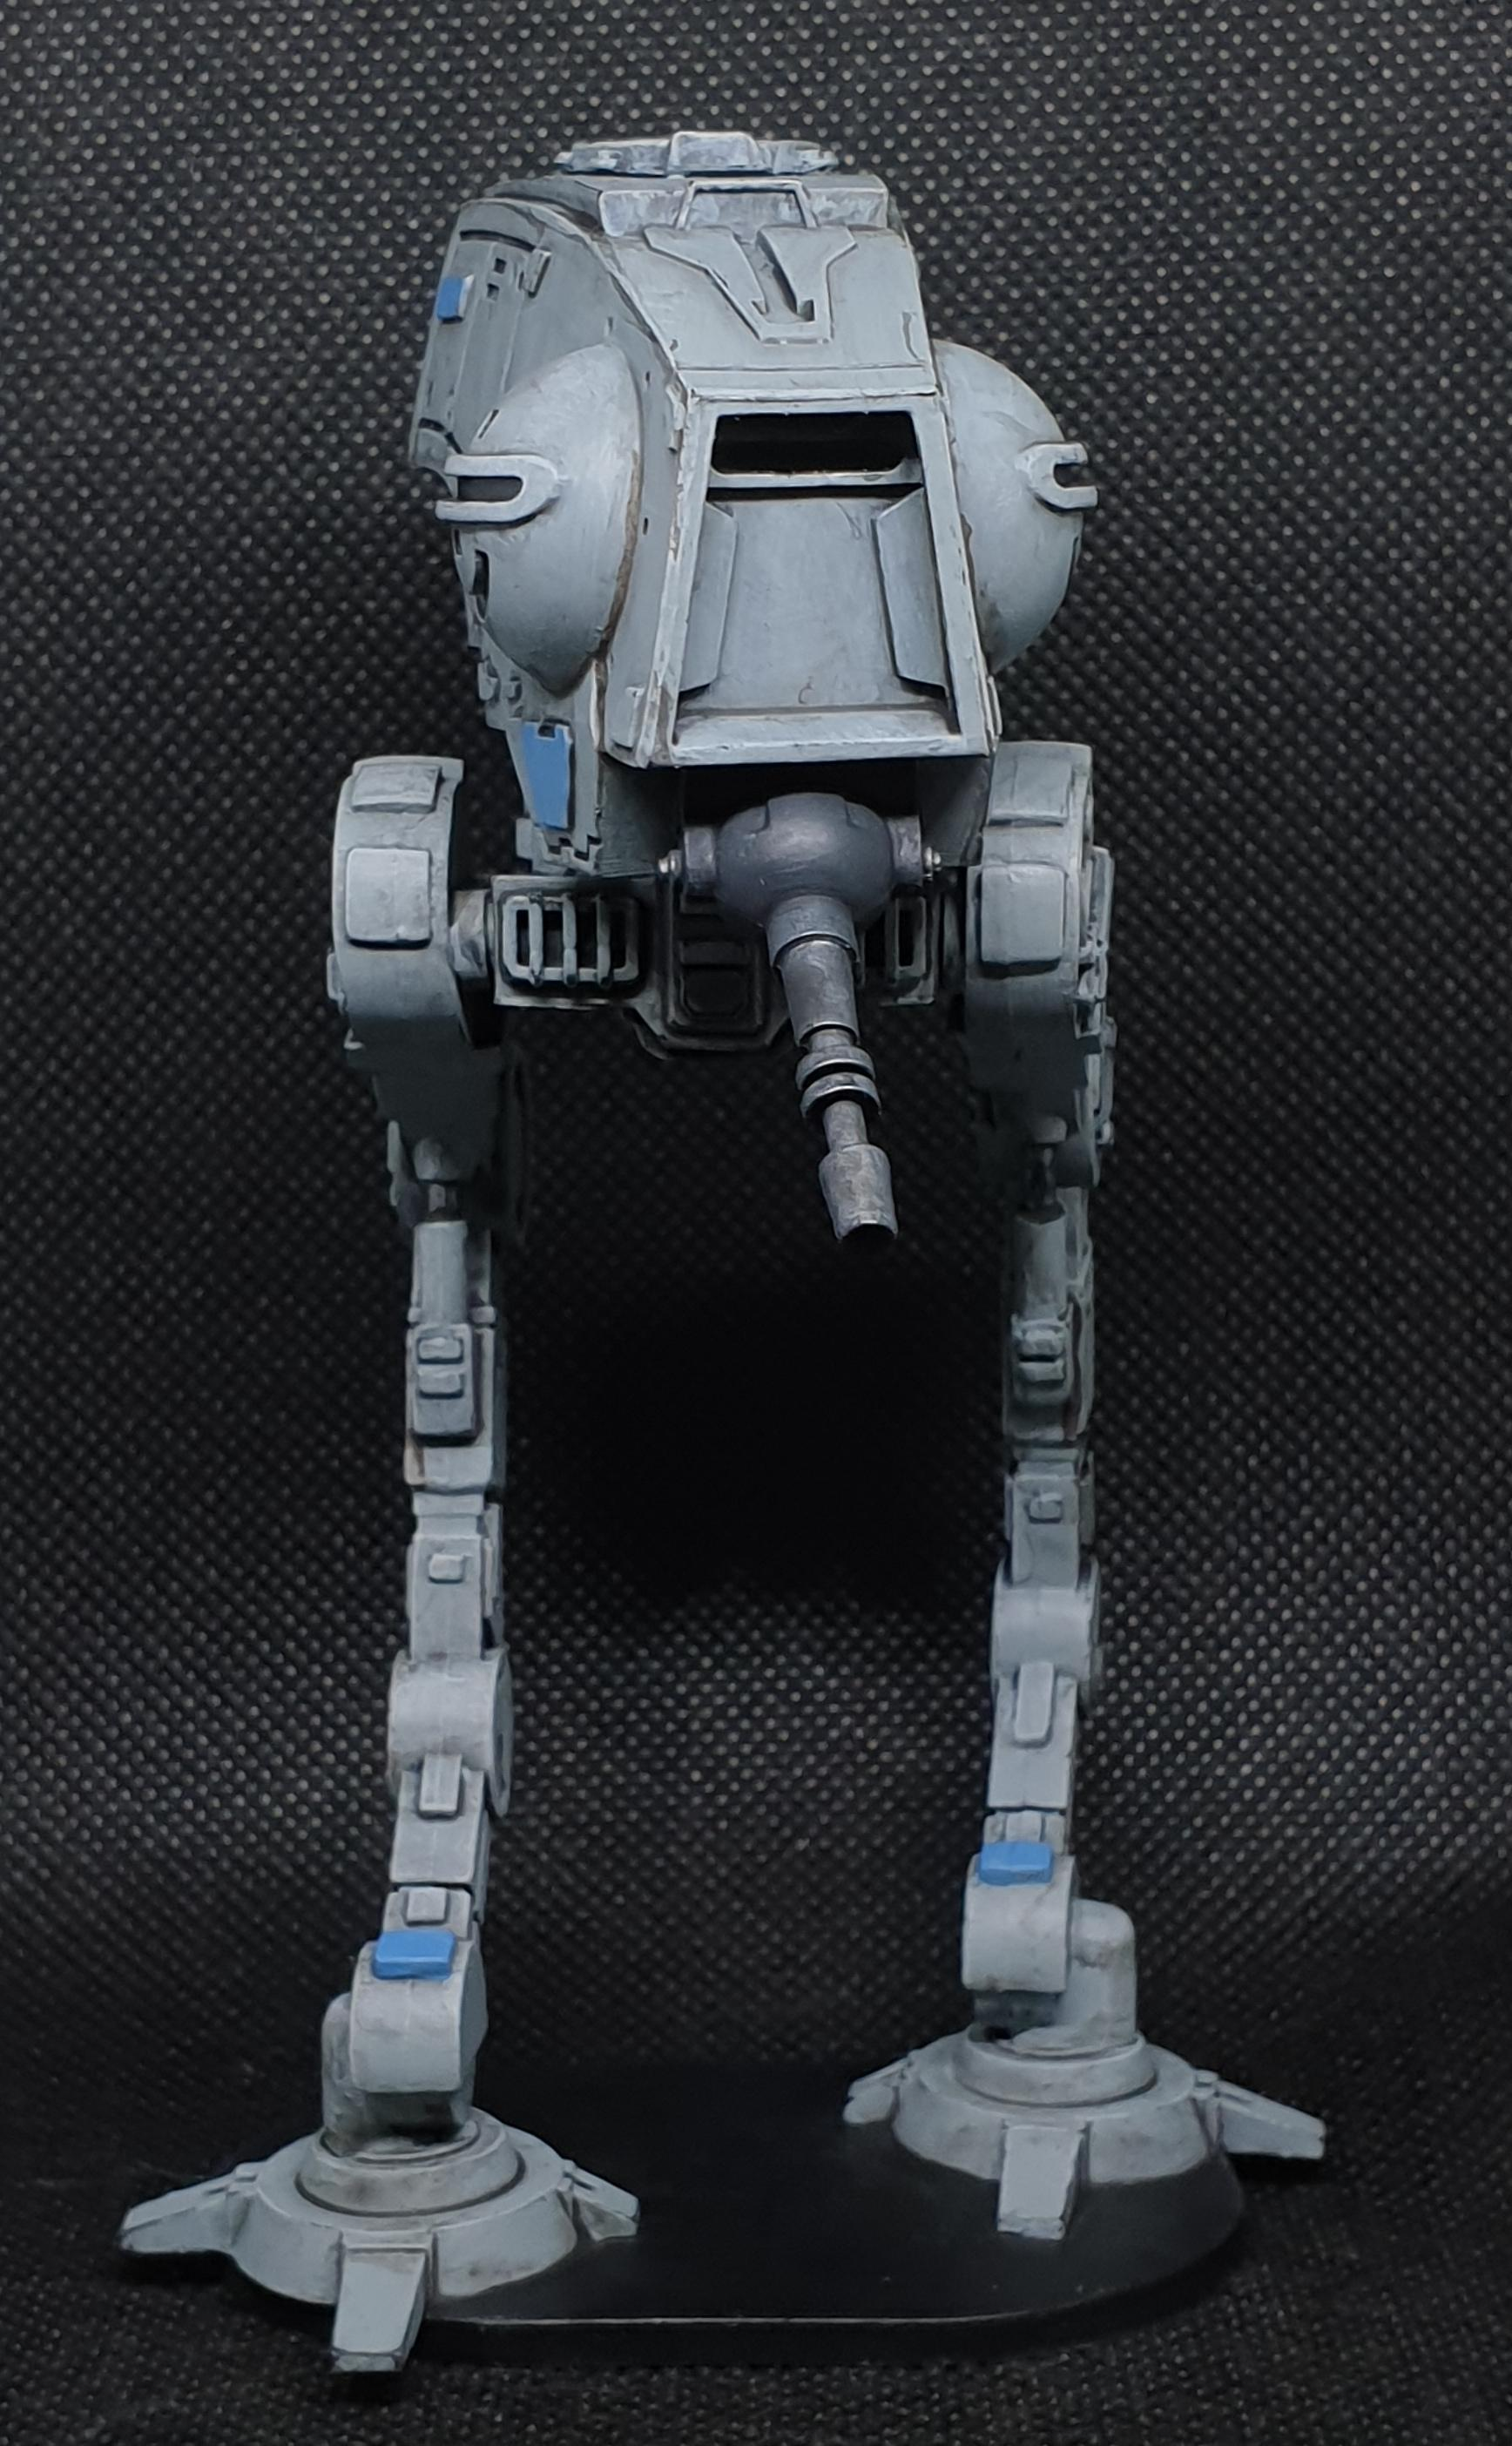 Imperial, Imperial Assault, Walker